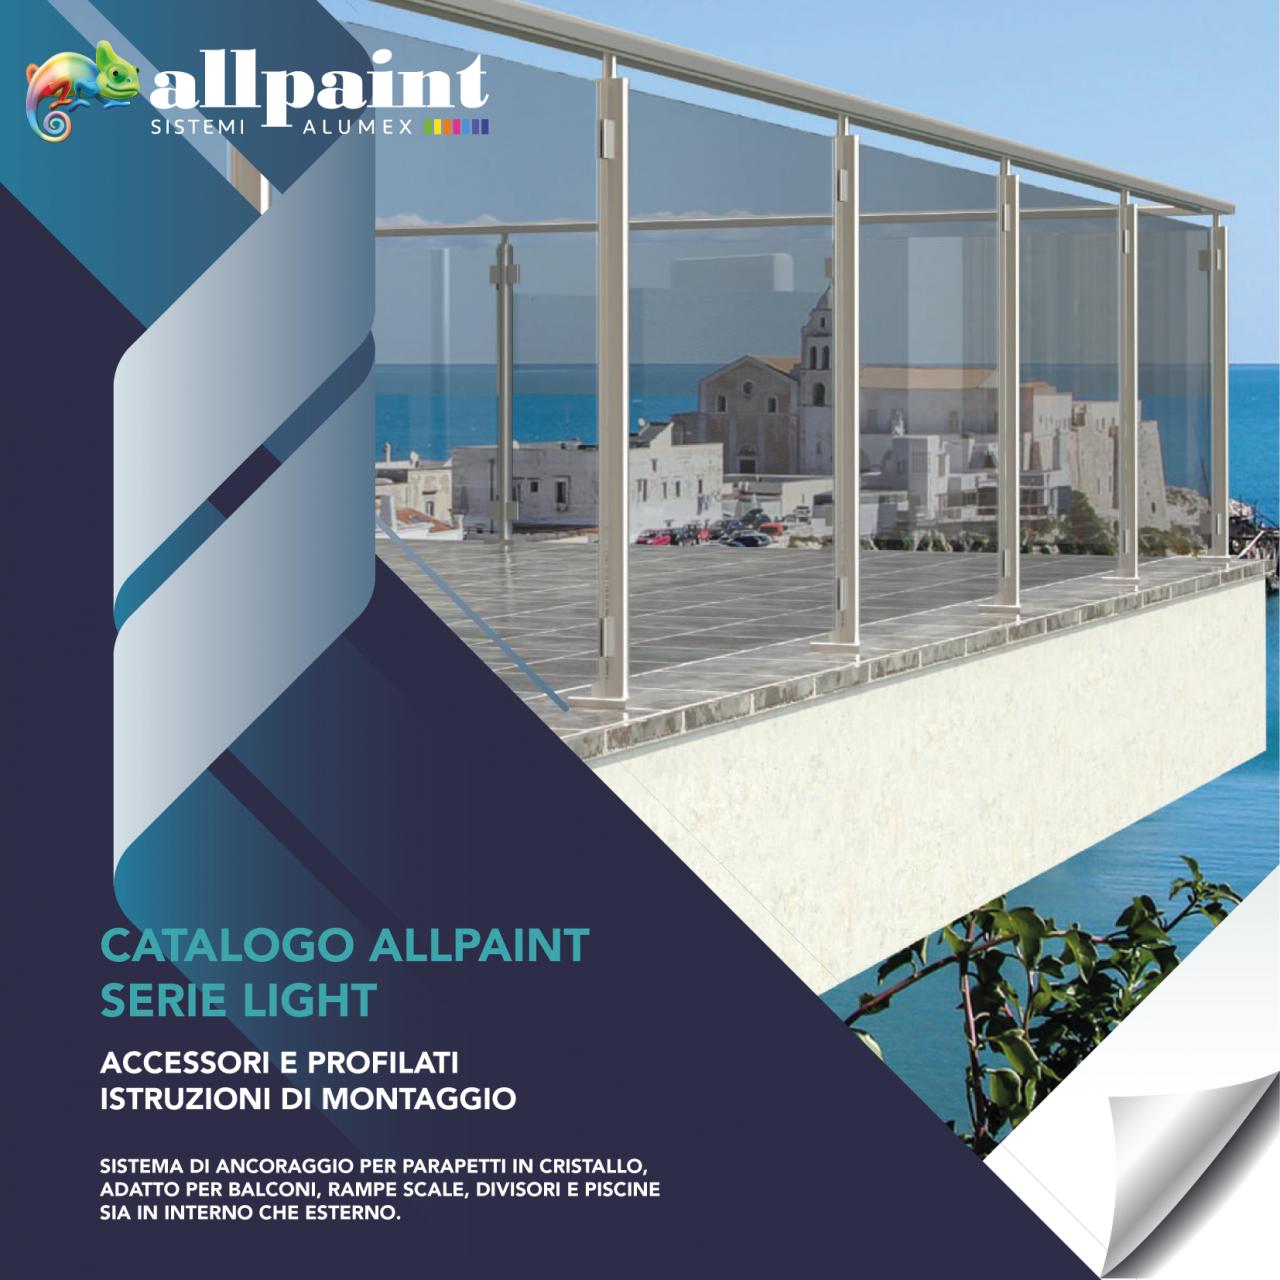 https://www.allpaint.it/wp-content/uploads/2021/08/Tavola-disegno-6-copia-4-1280x1280.png